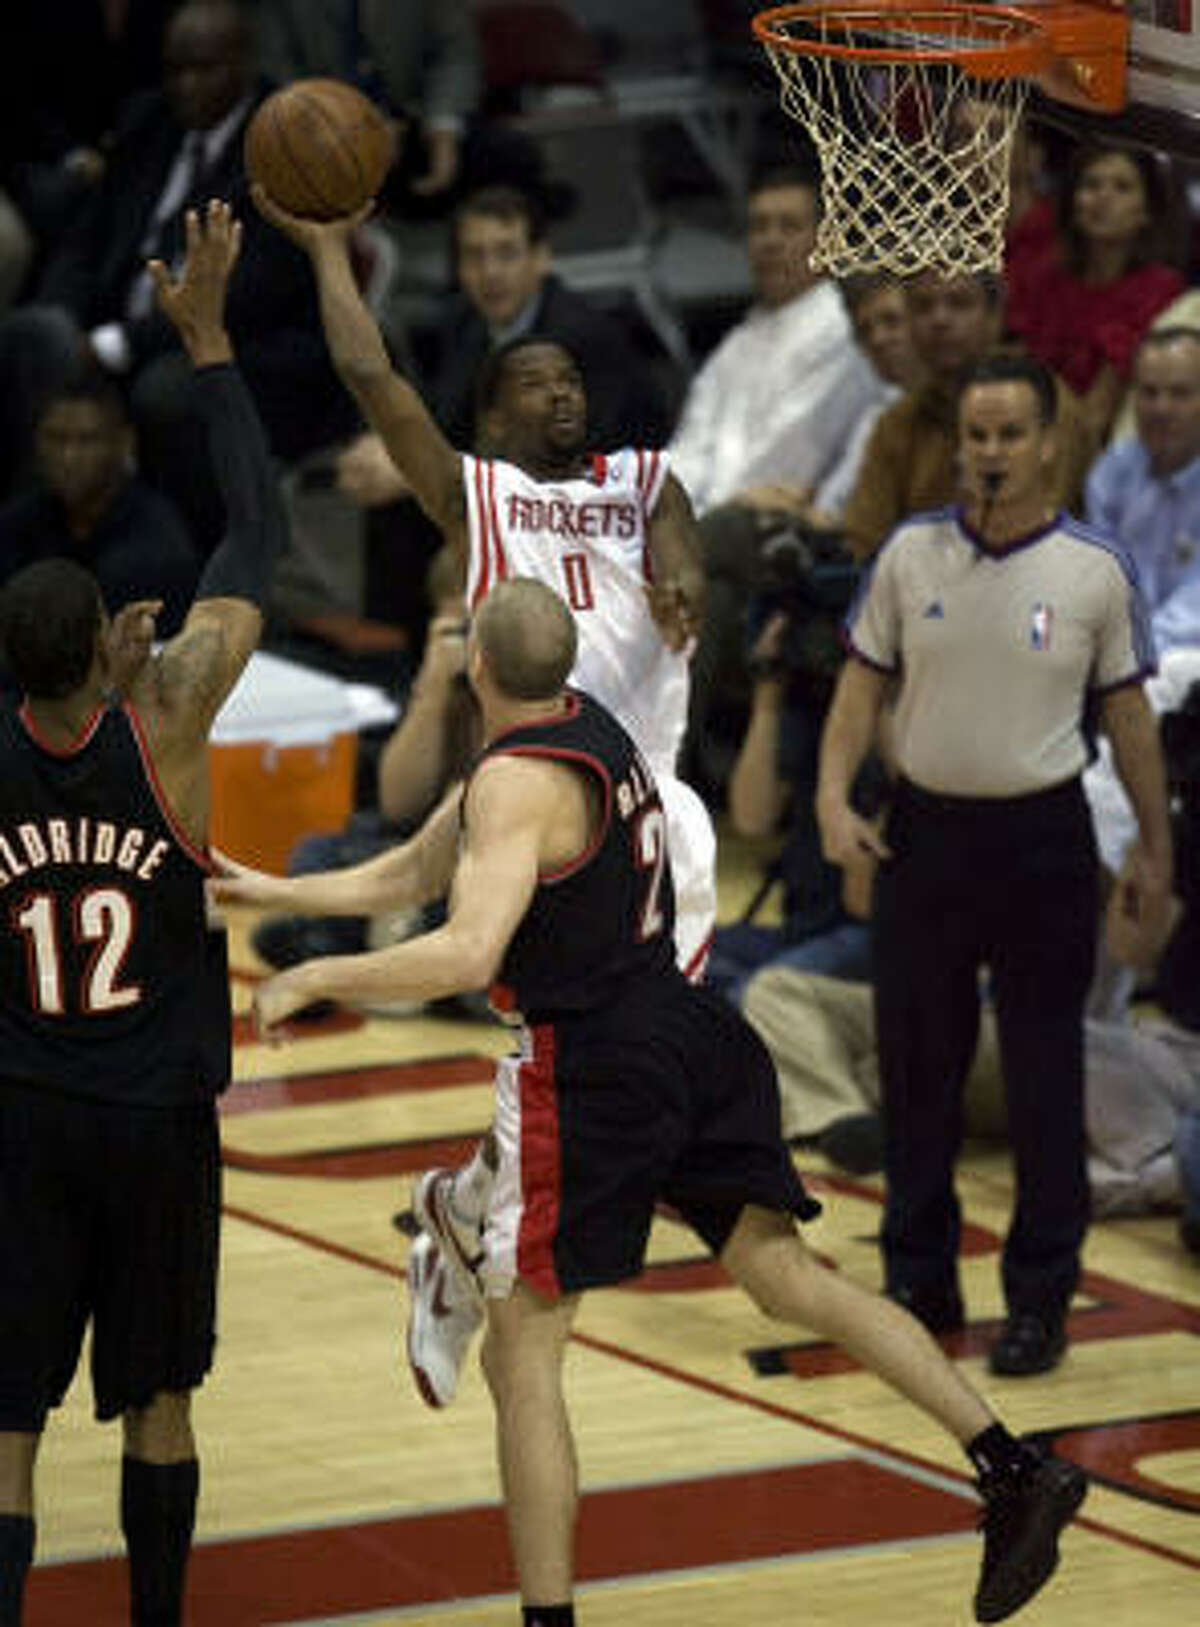 Rockets guard Aaron Brooks (0) takes a shot over Portland Trail Blazers guard Steve Blake (2) and forward LaMarcus Aldridge (12) during the first quarter.